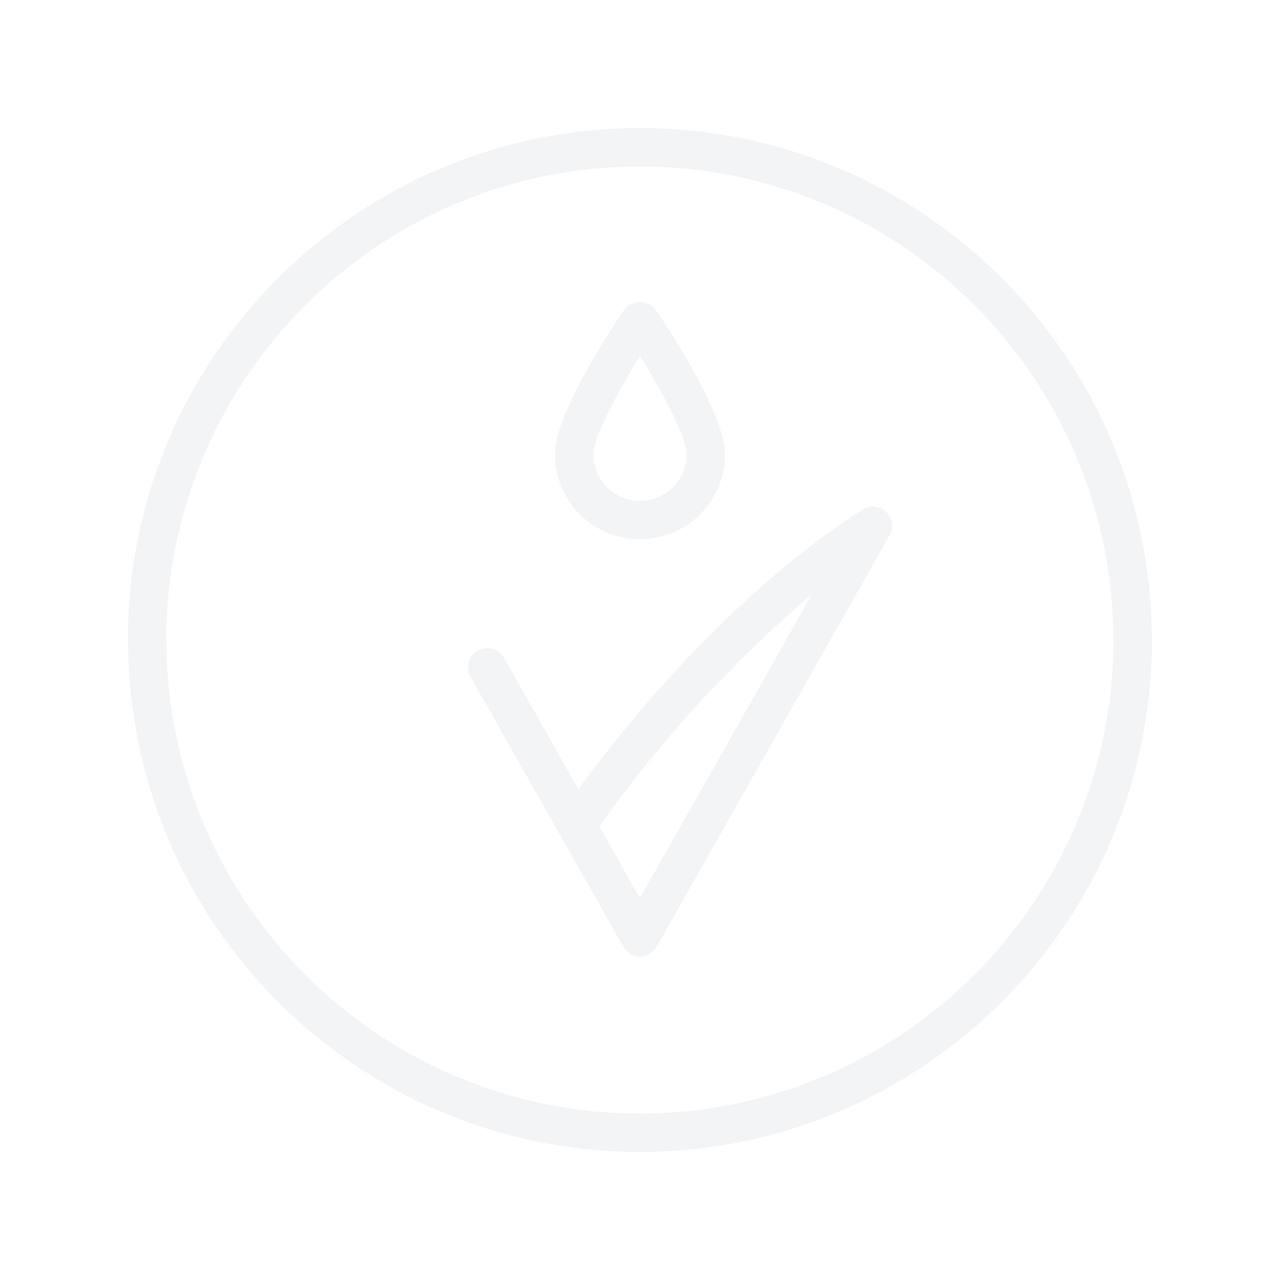 MIZON Joyful Time Essence Cucumber Mask 23g тканевая маска для лица